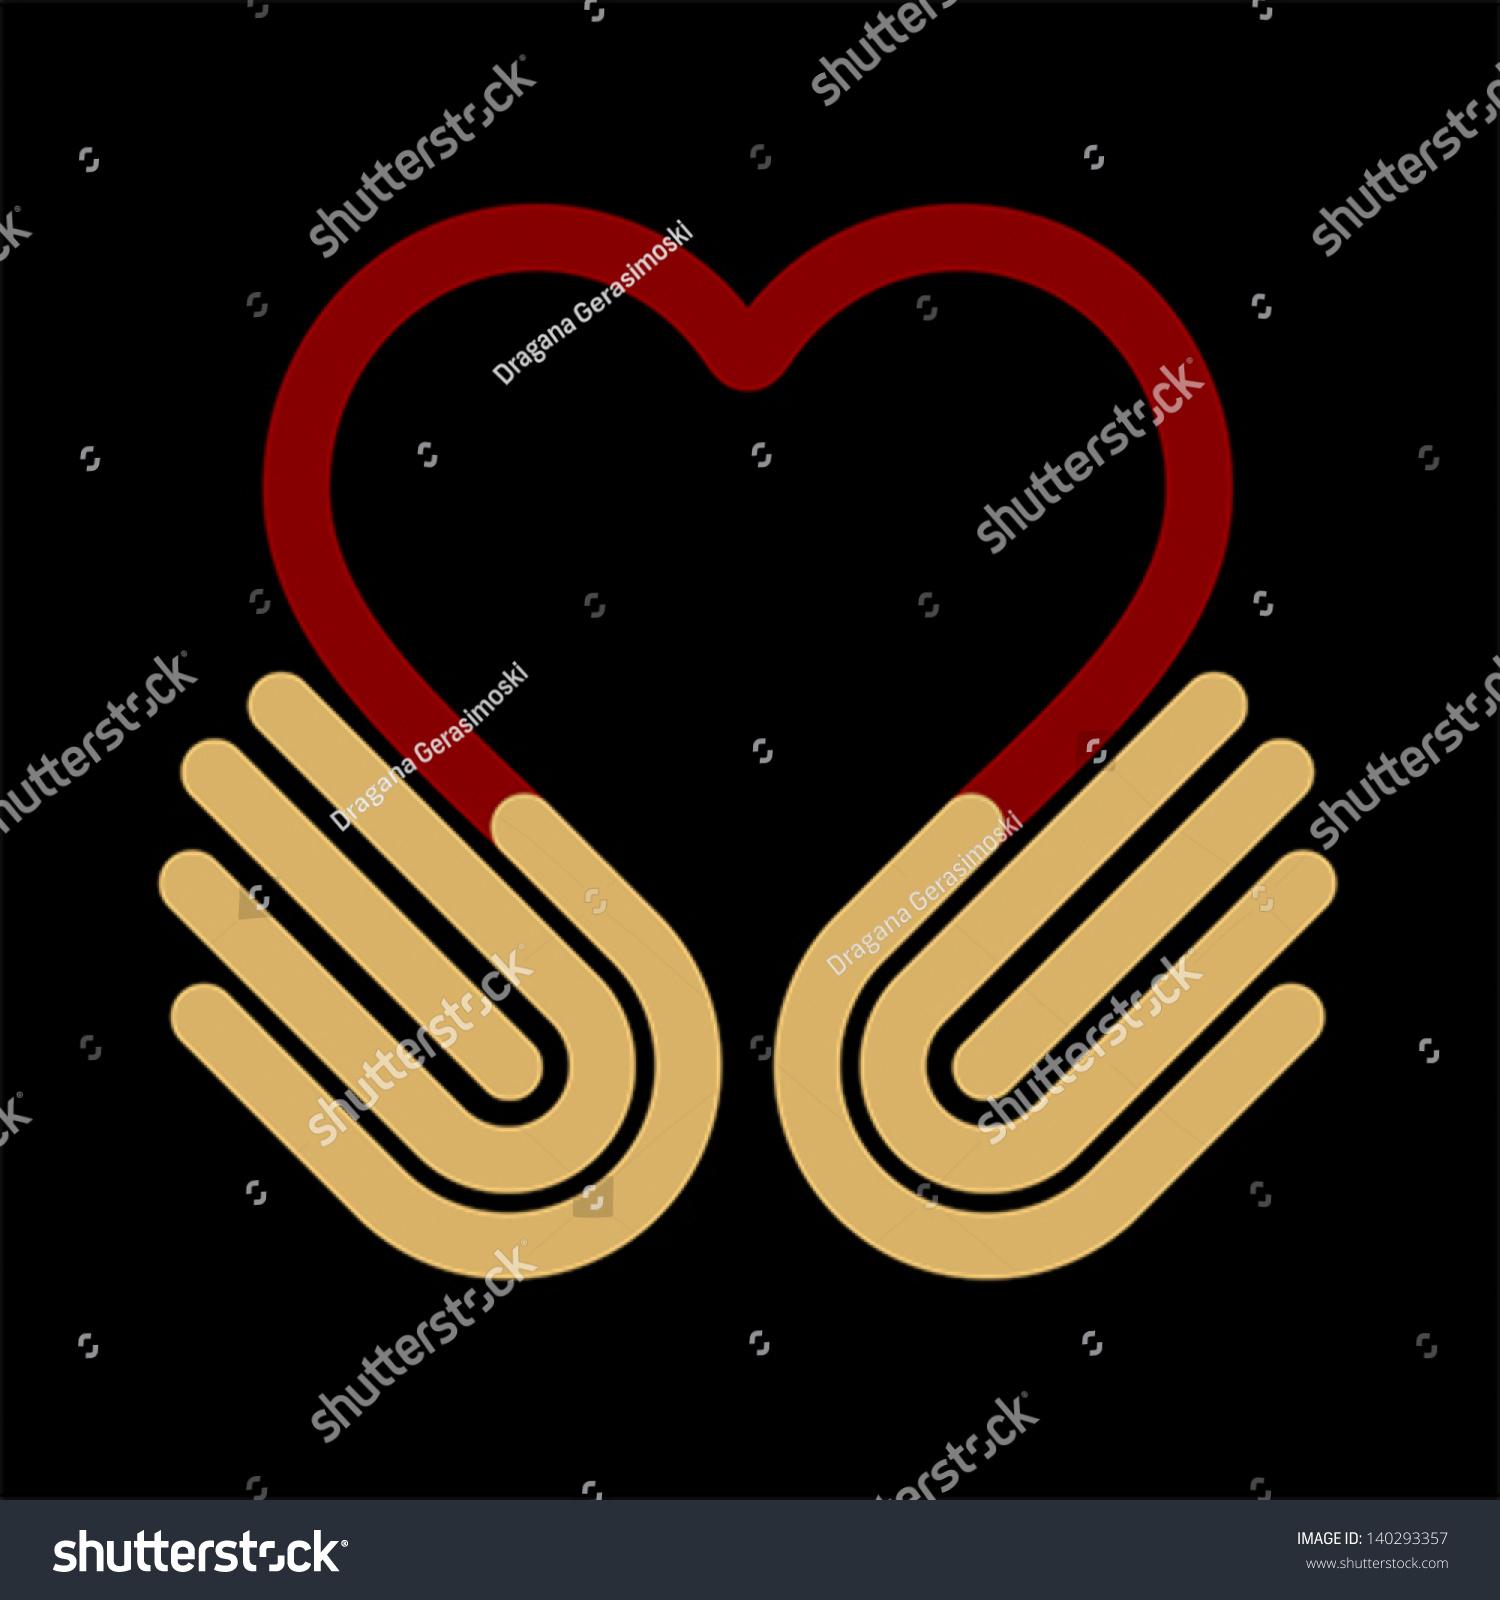 Heart Symbol Hands Help Concept Give Stock Vector 140293357